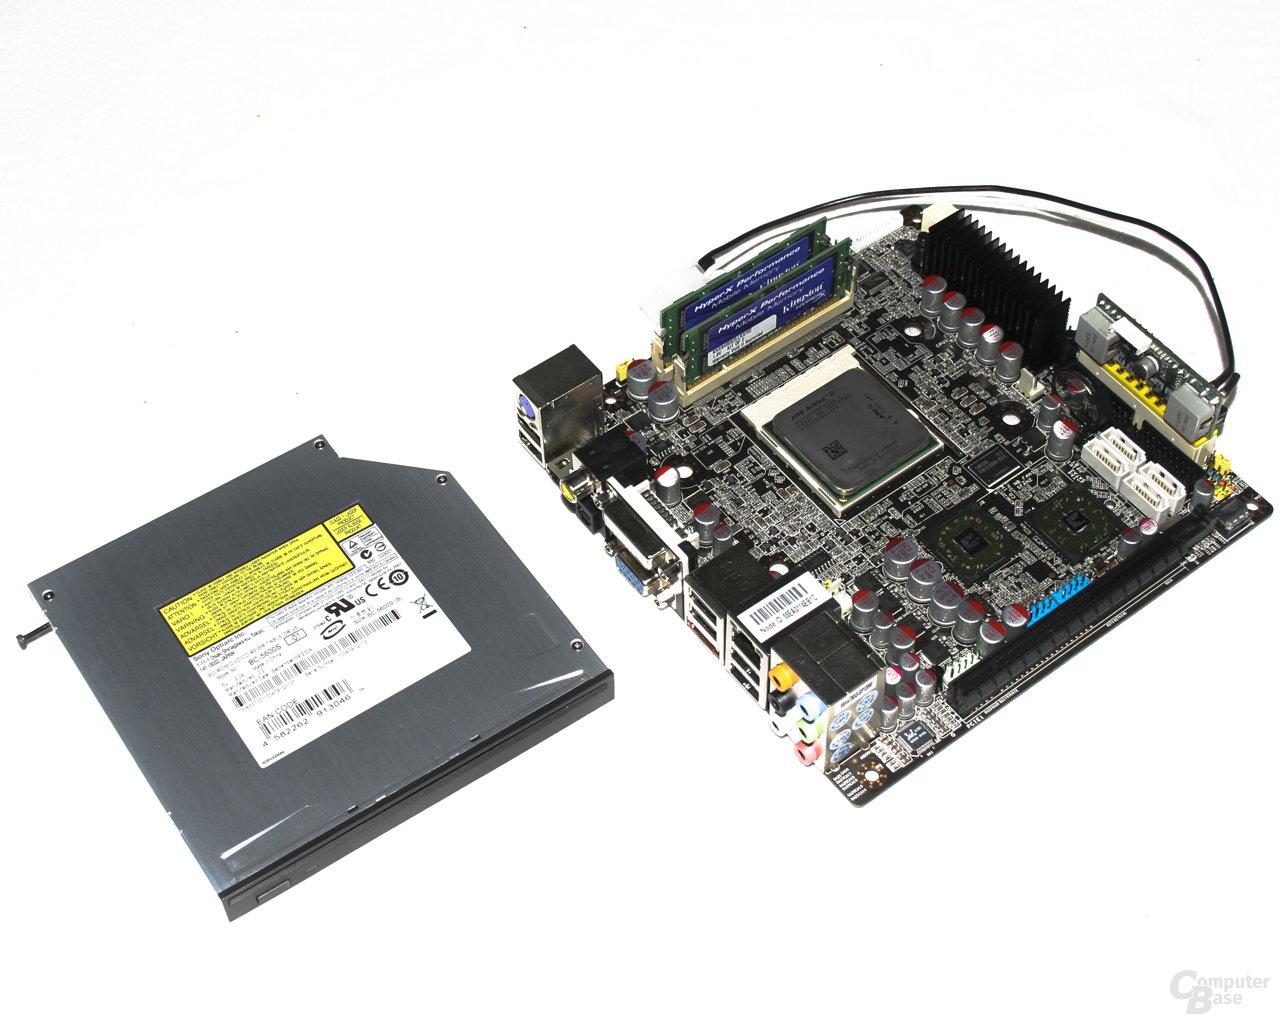 Soartec picoX – Mainboard und Blu-Ray-Laufwerk